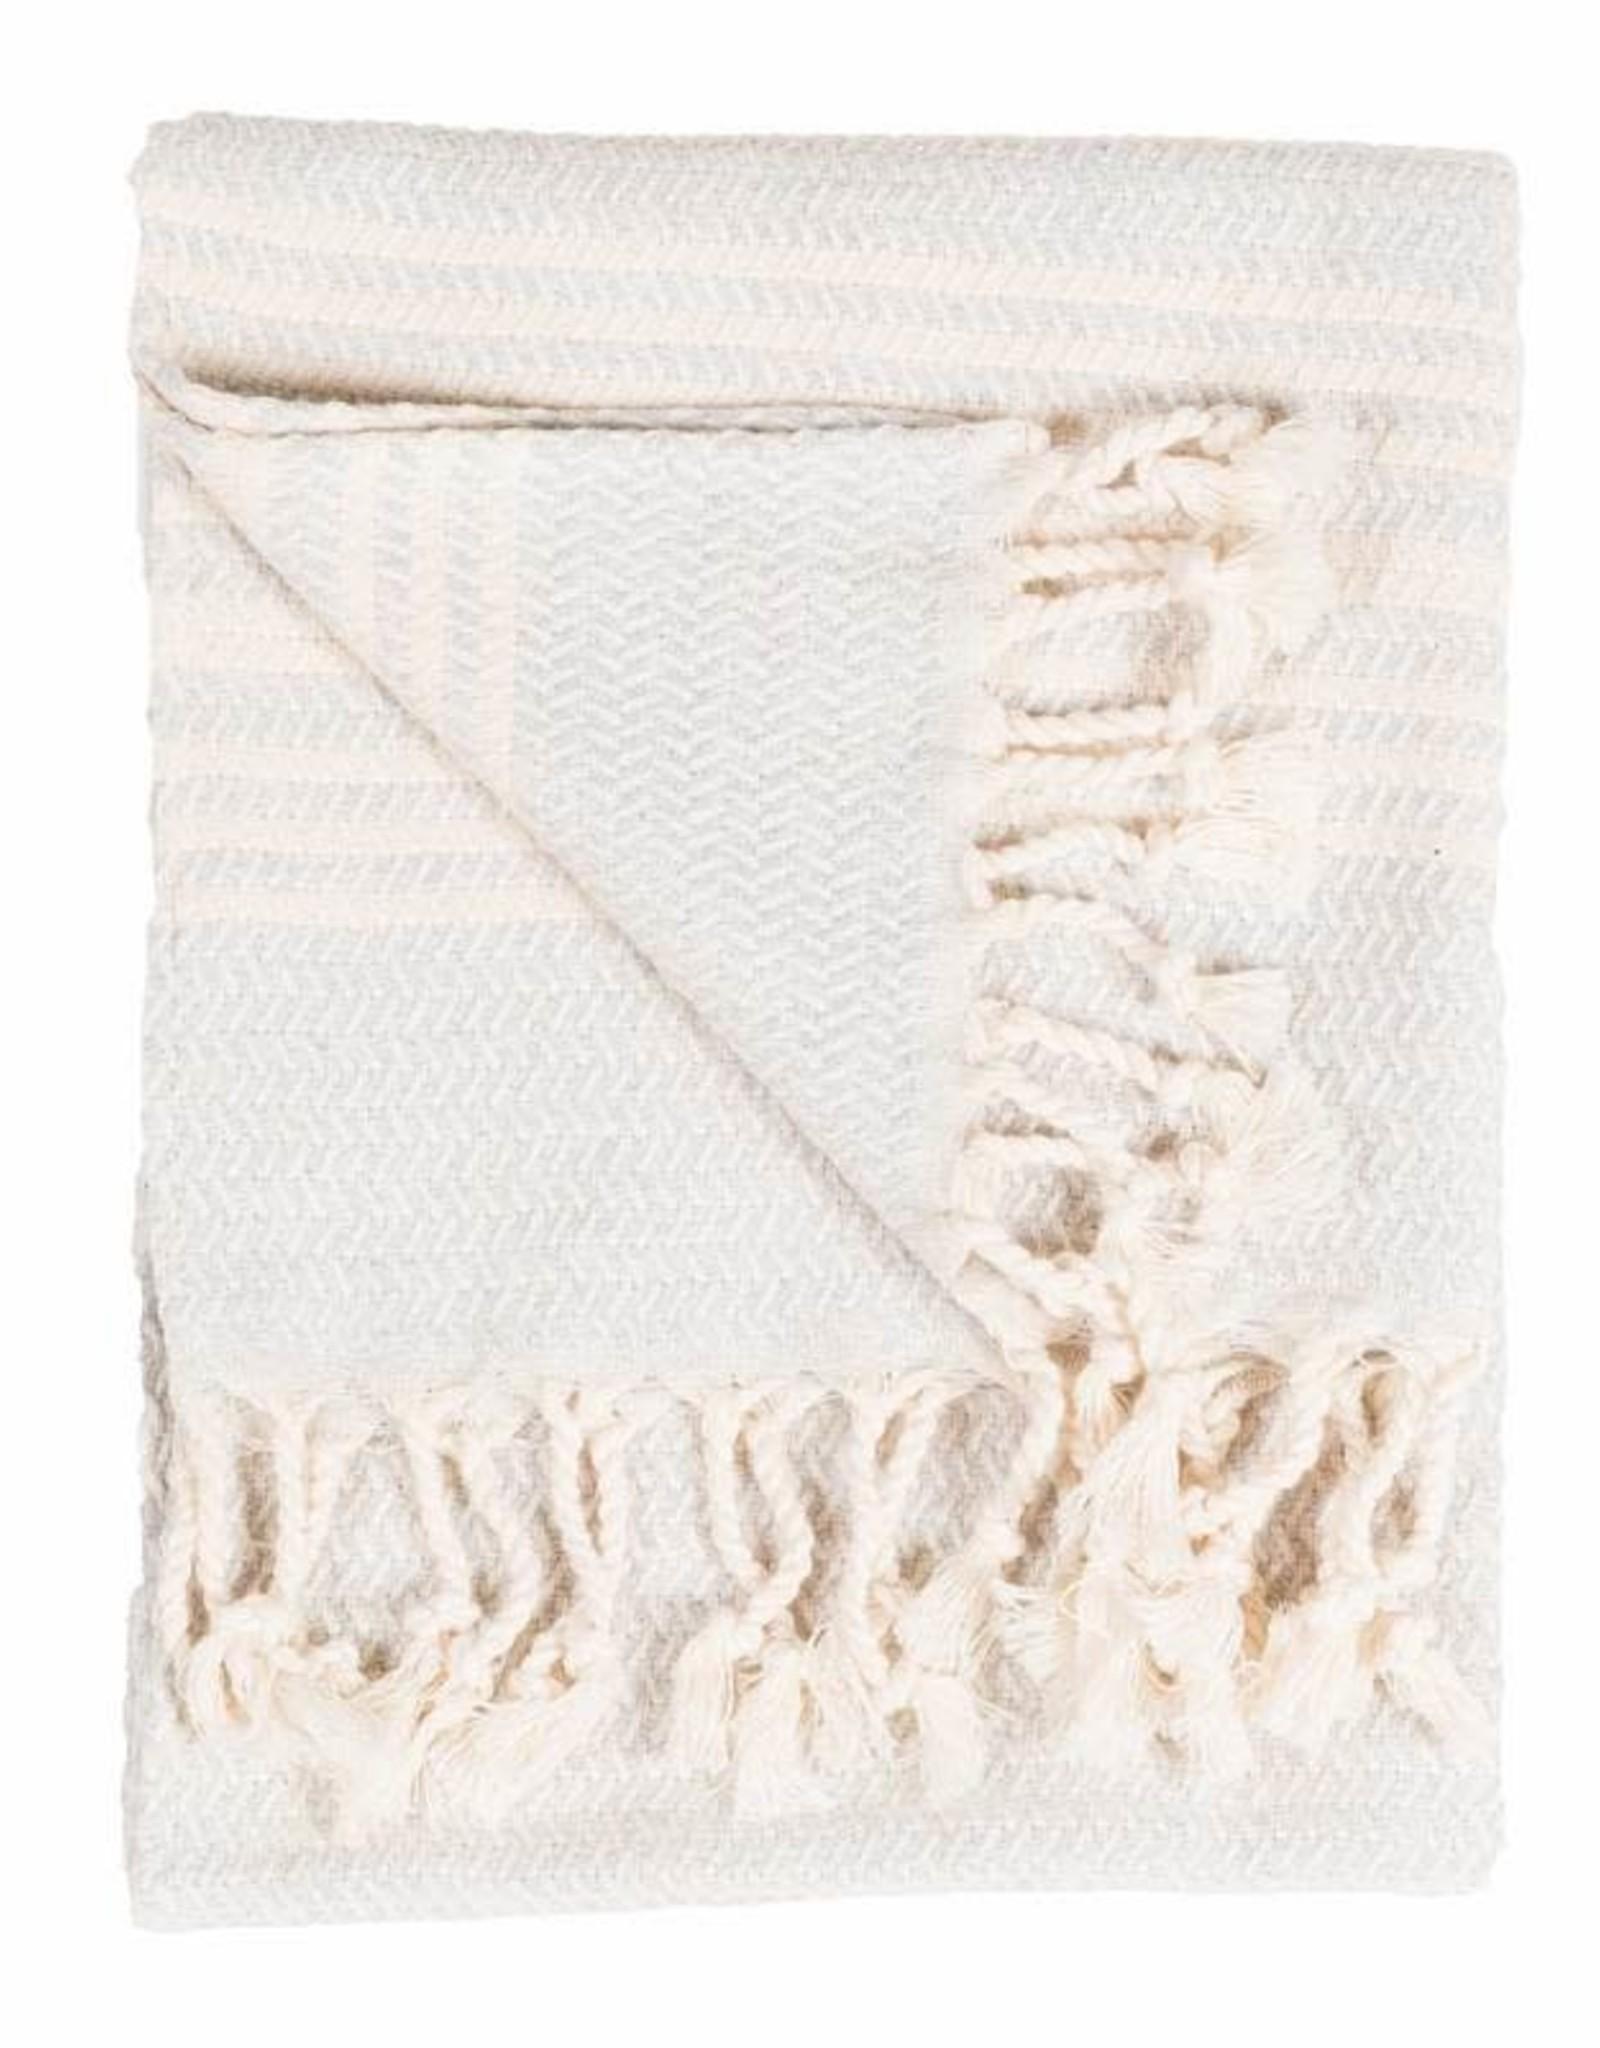 Mist Hasir Turkish Hand Towel